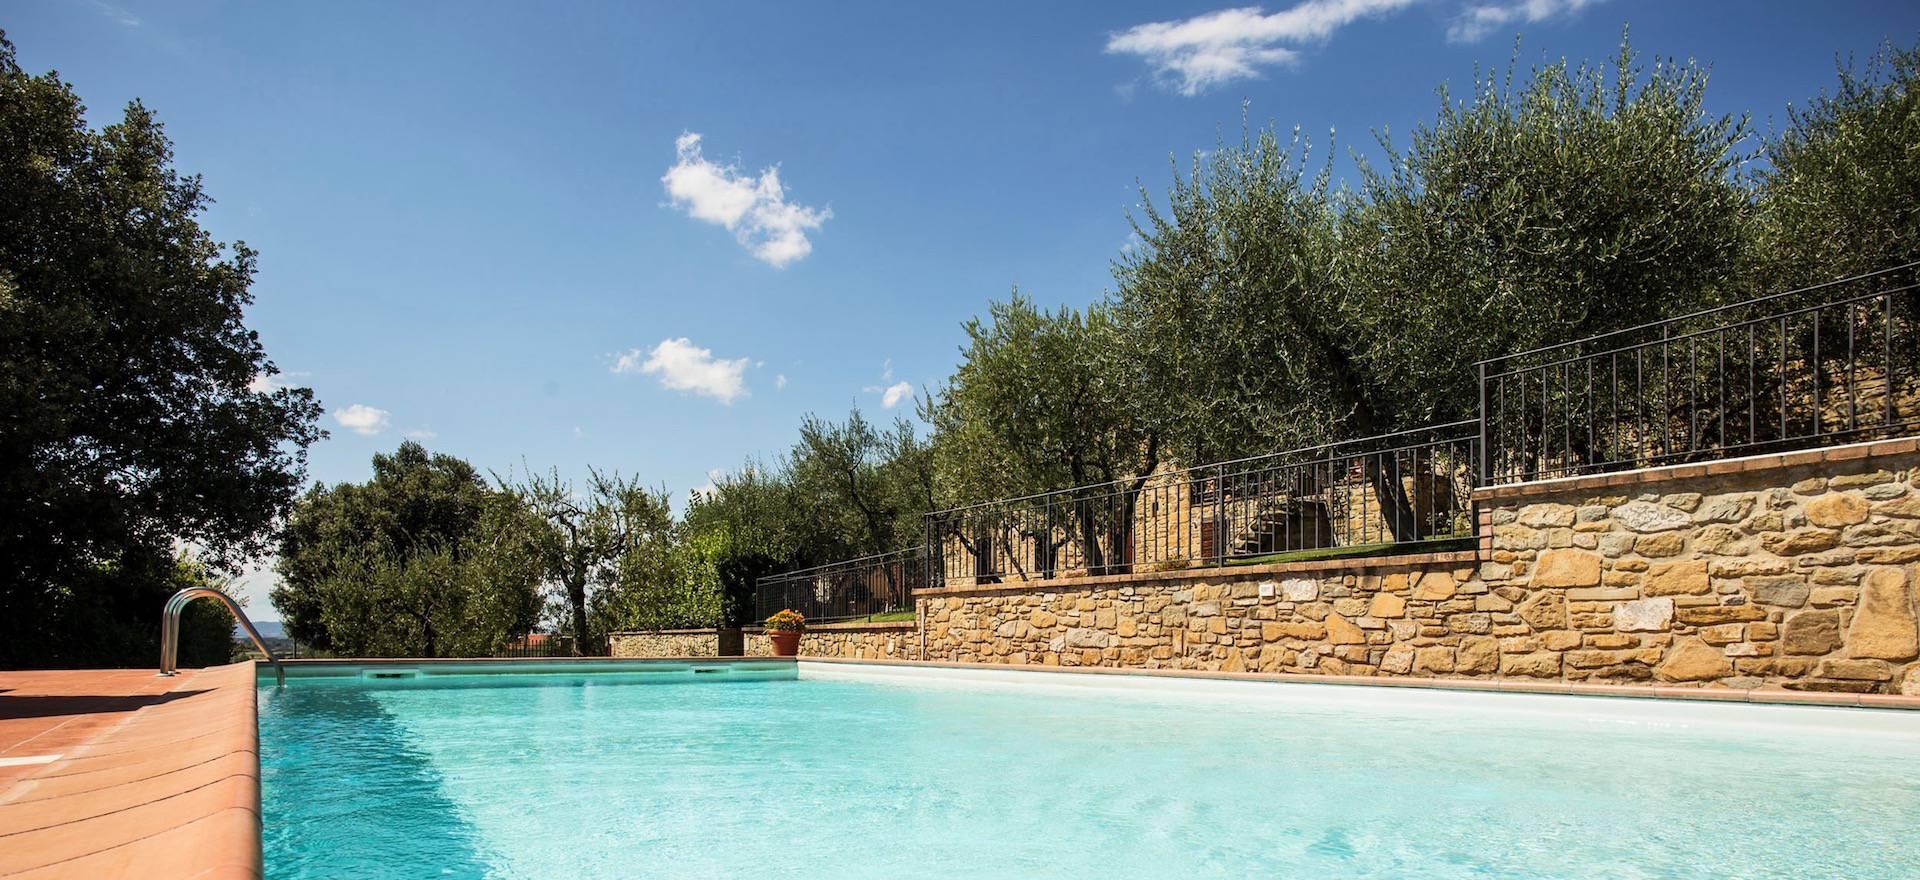 Agriturismo Toscane Gemoedelijke agriturismo in de buurt van Cortona